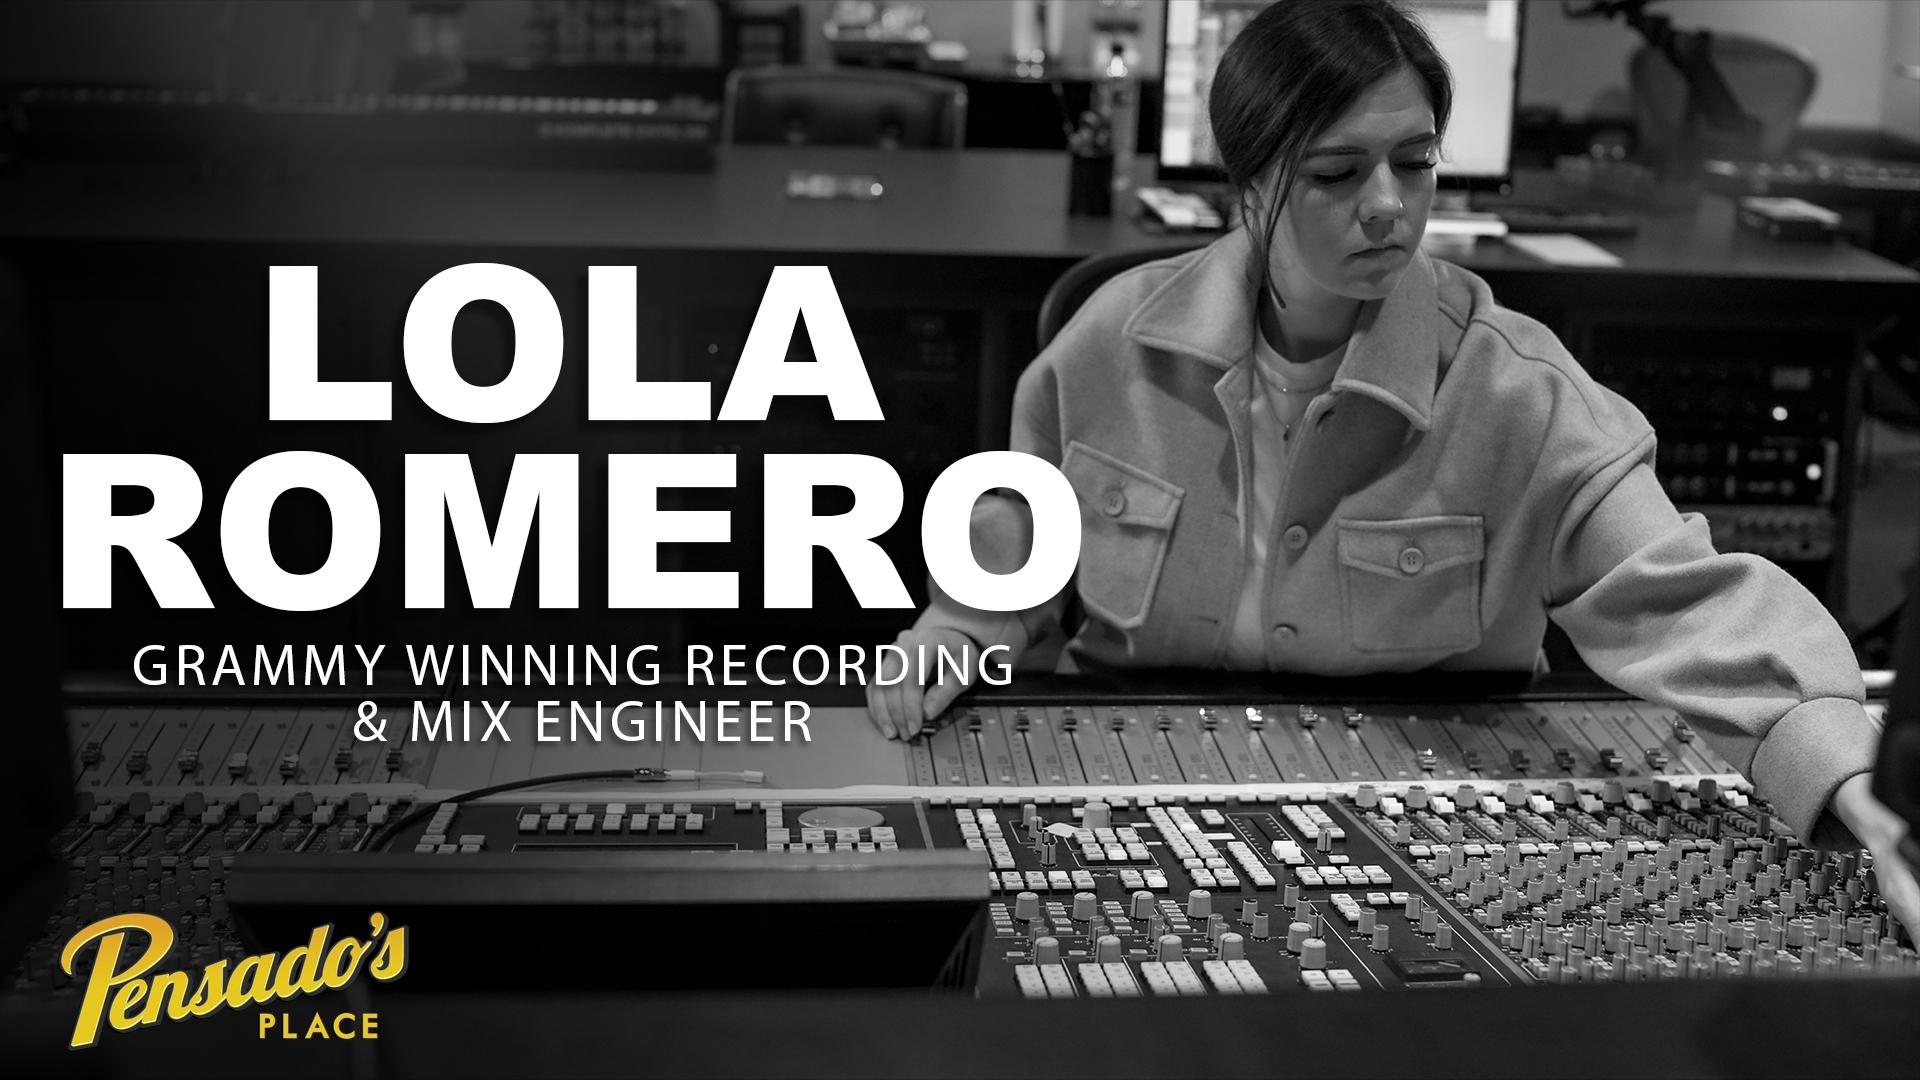 Grammy Winning Recording & Mix Engineer, Lola Romero